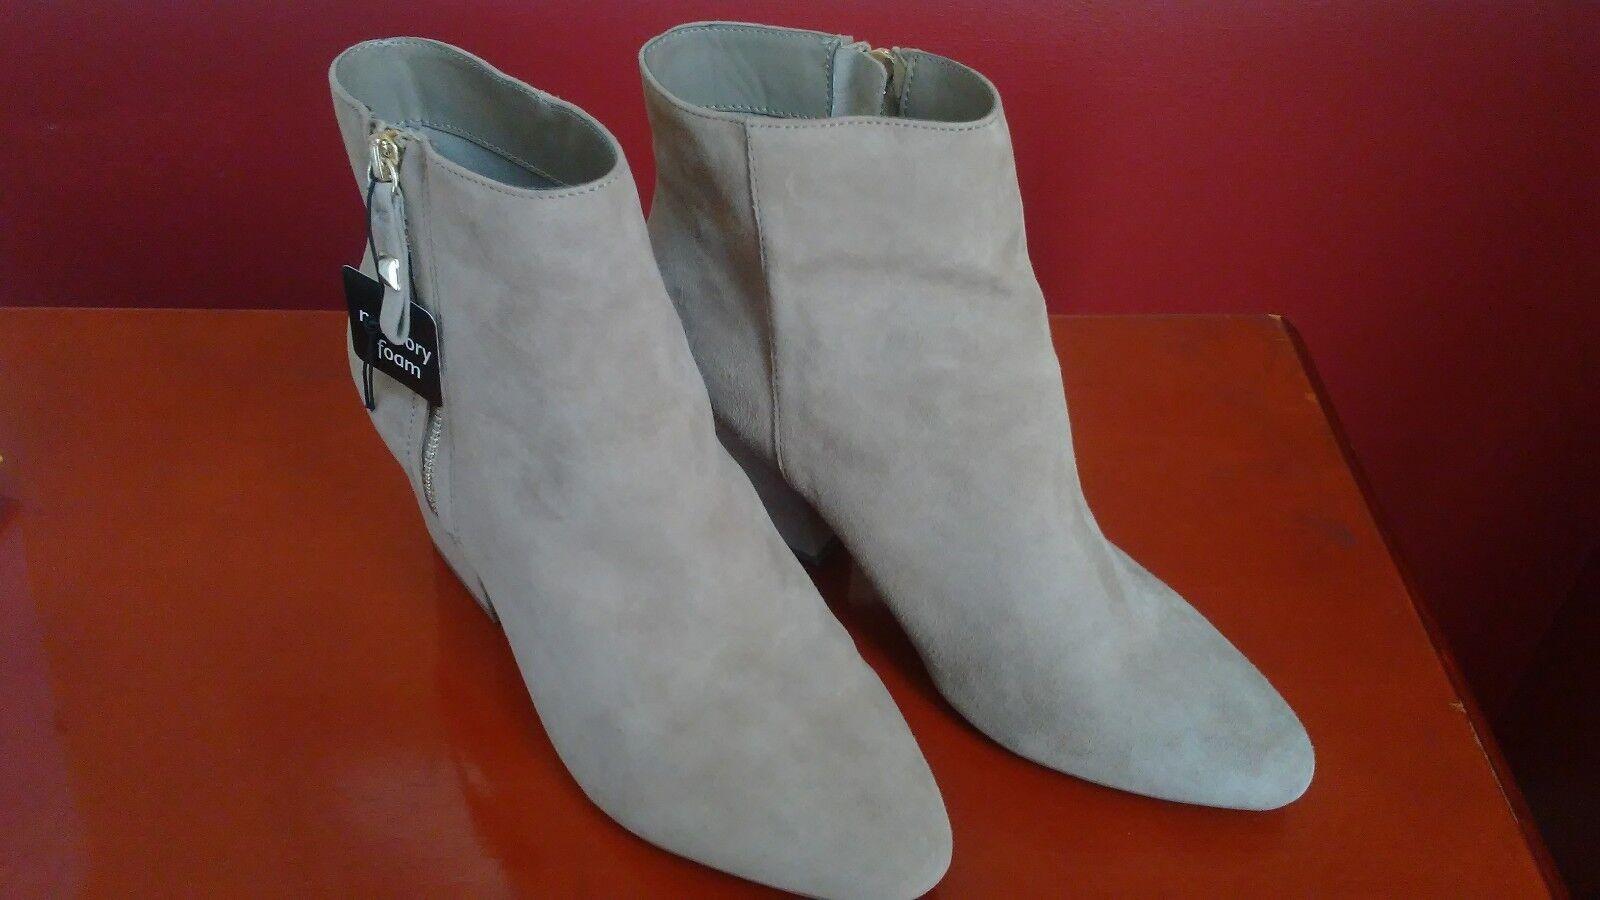 Liz Claiborne Genuine Suede Ankle Stiefel, Größe 11, Taupe, Memory Foam, Brand NEU